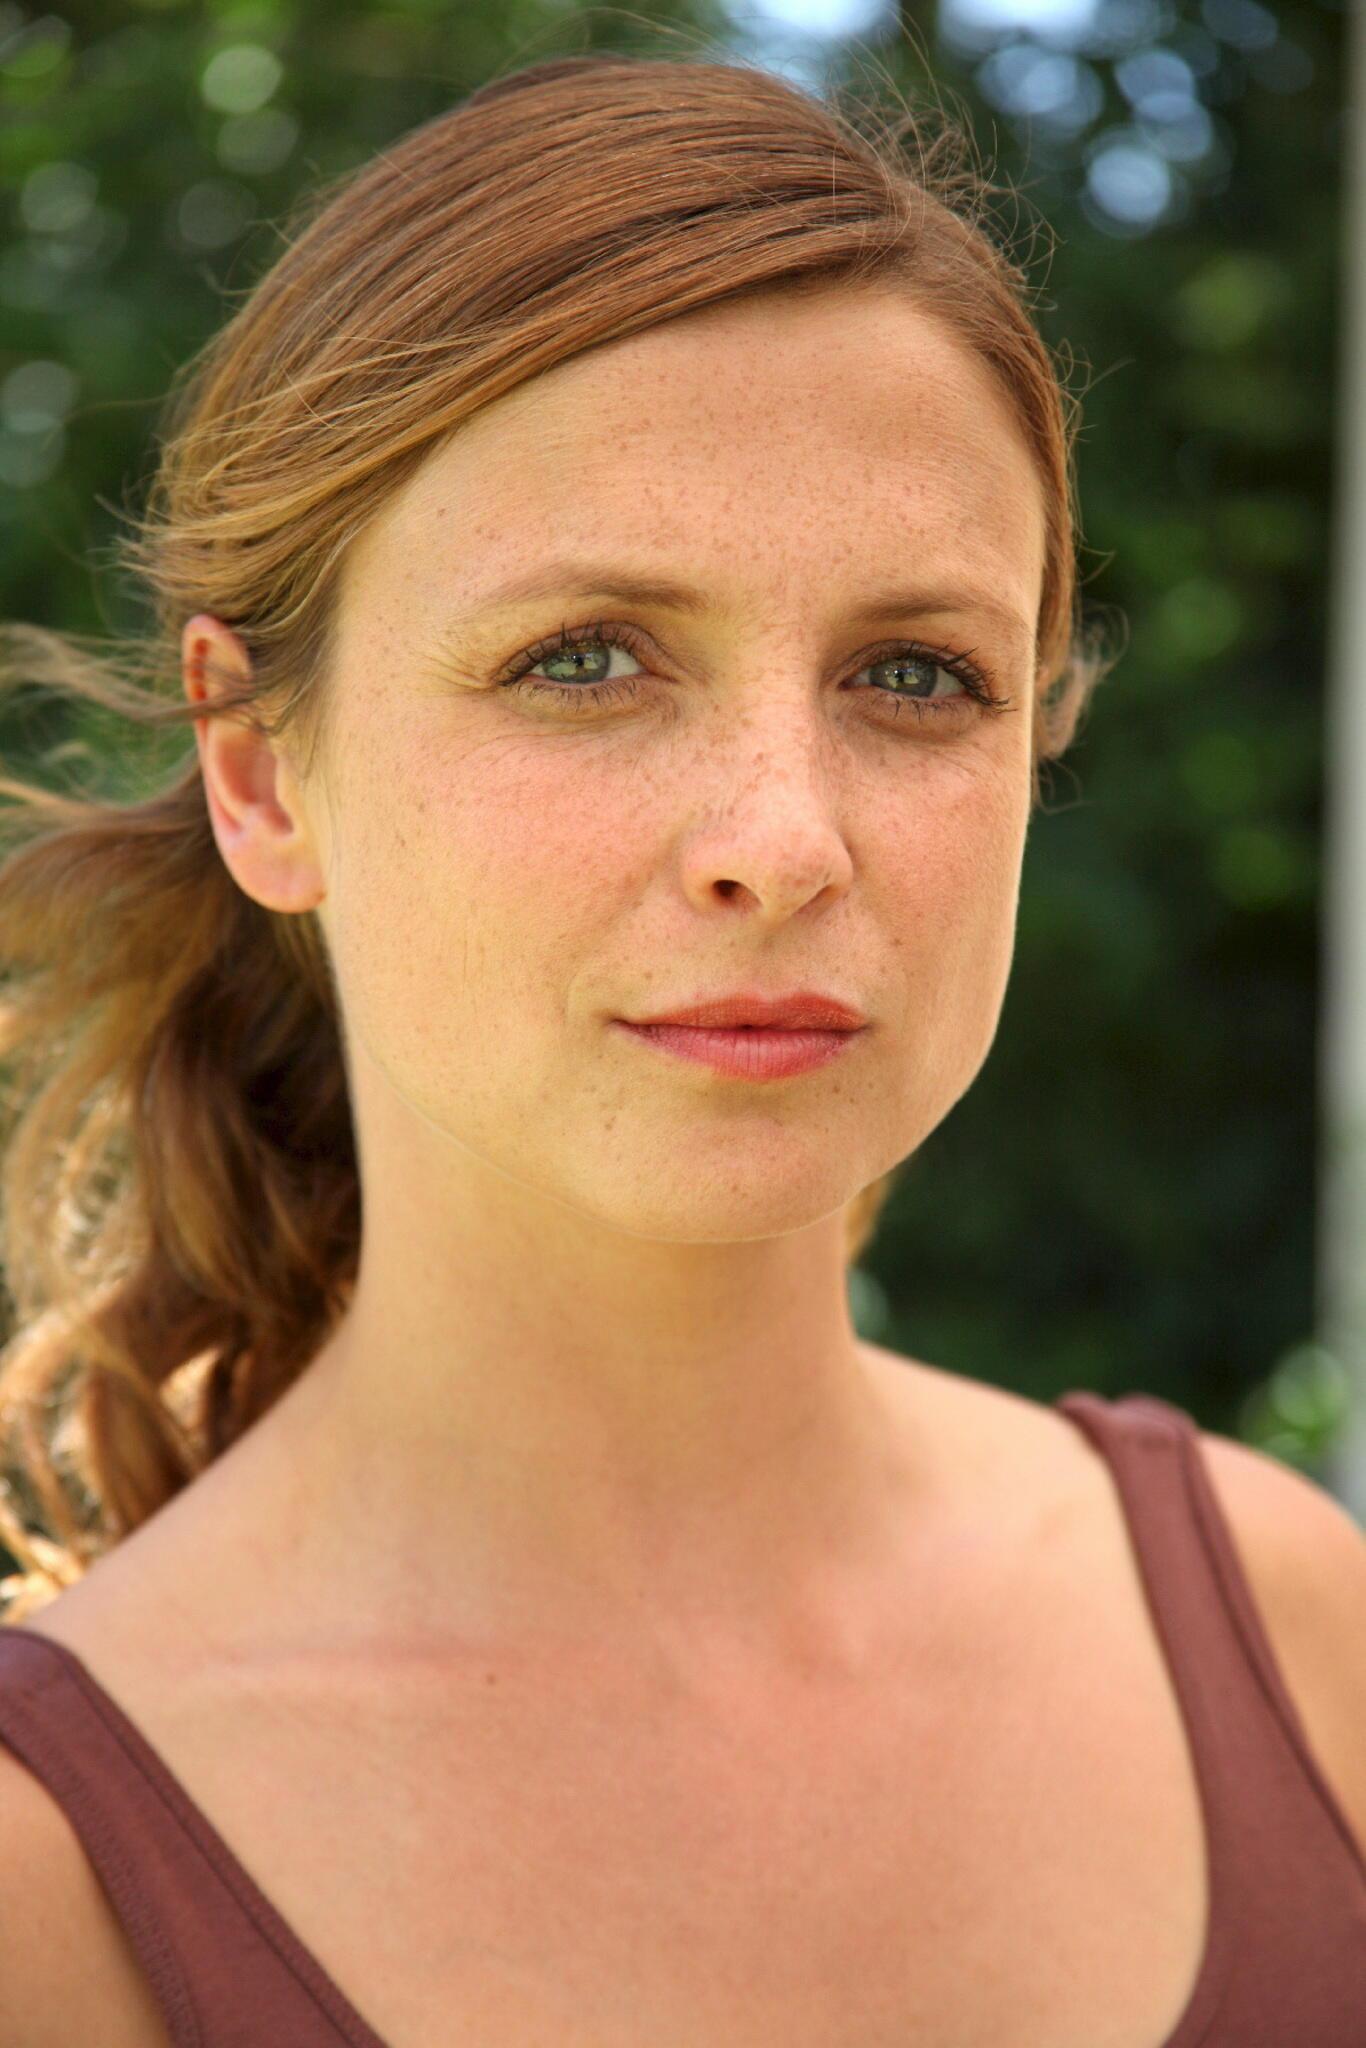 Julia Brendtner